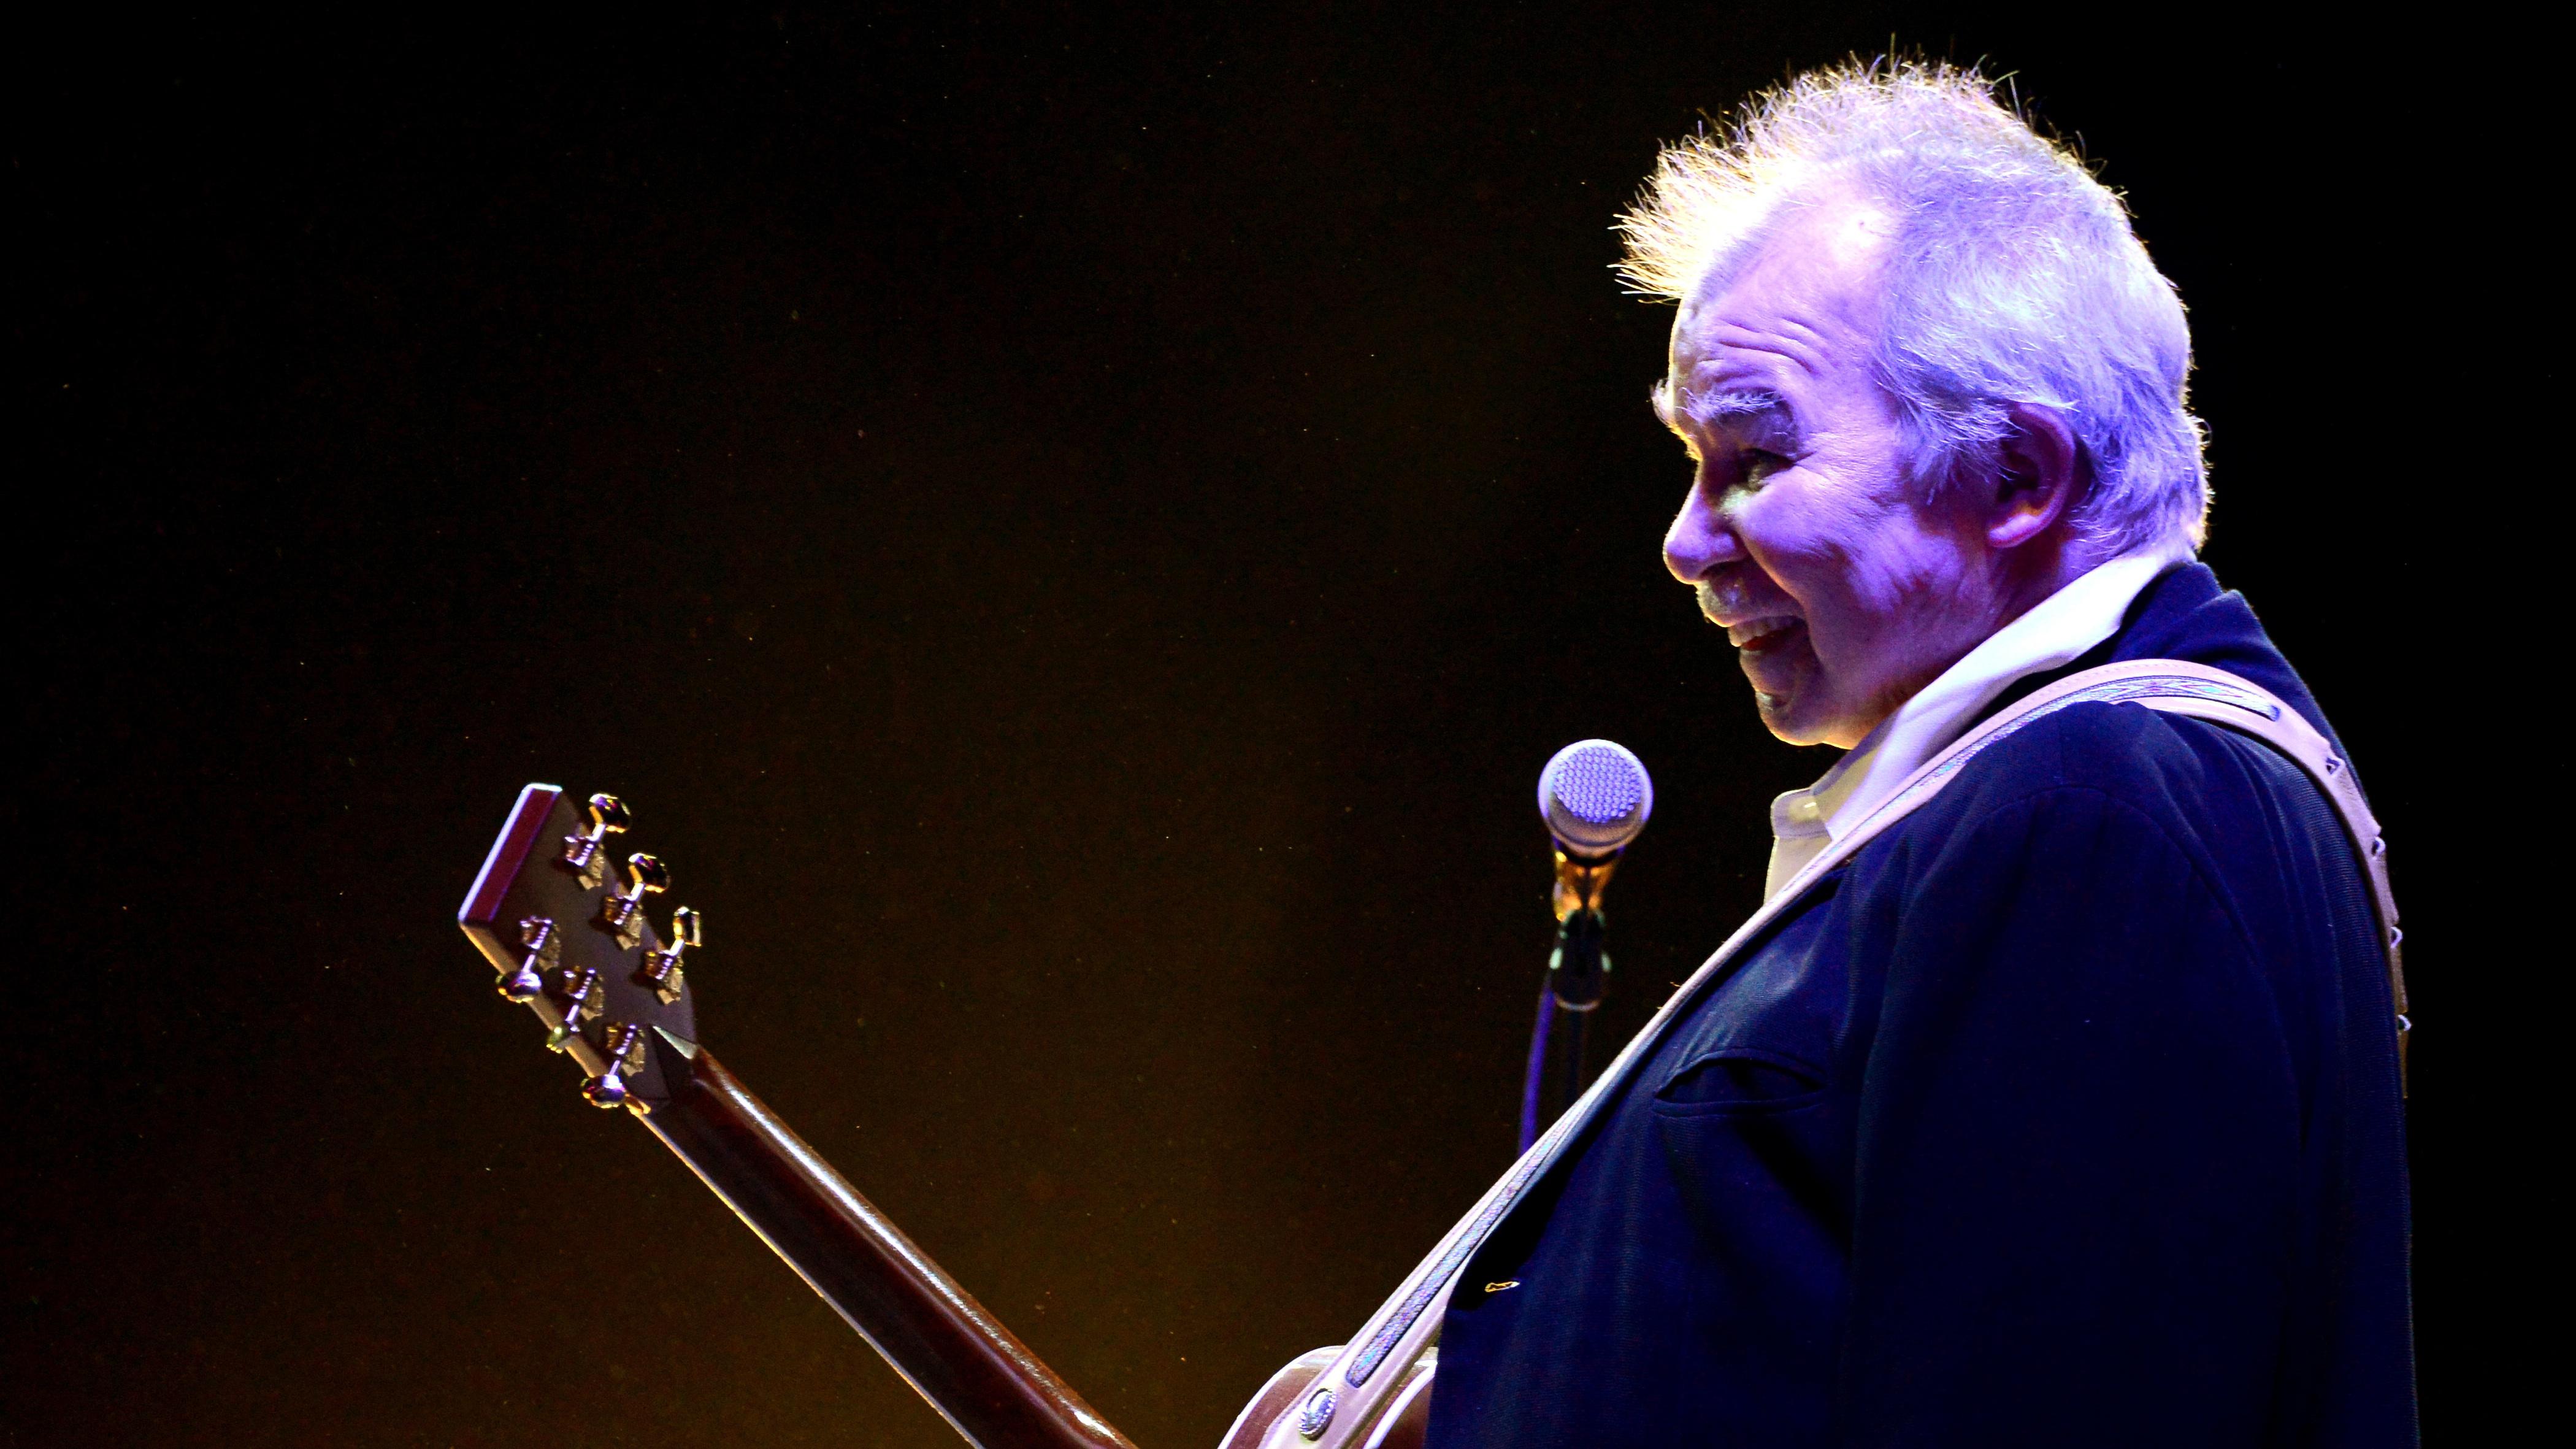 John Prine, performing during Coachella on April 27, 2014.